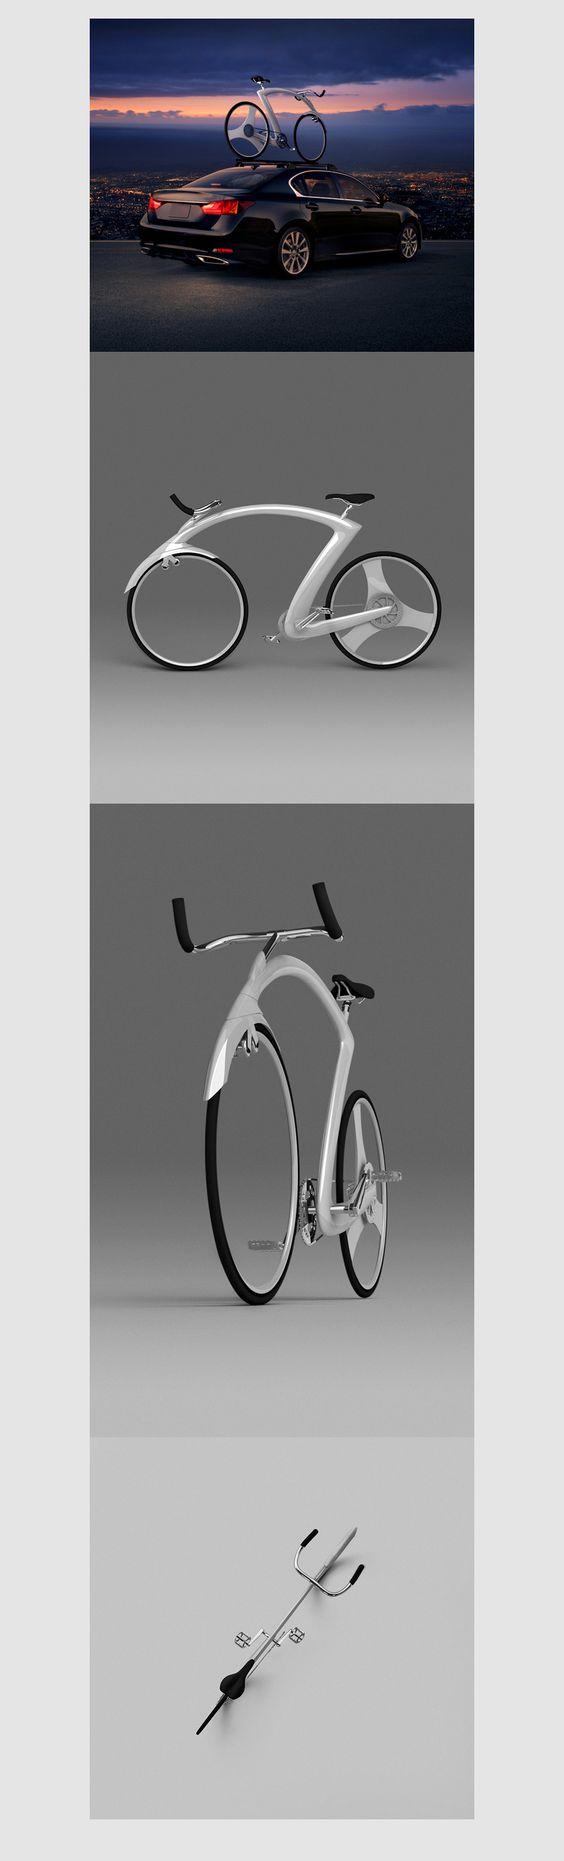 Bike Concept: